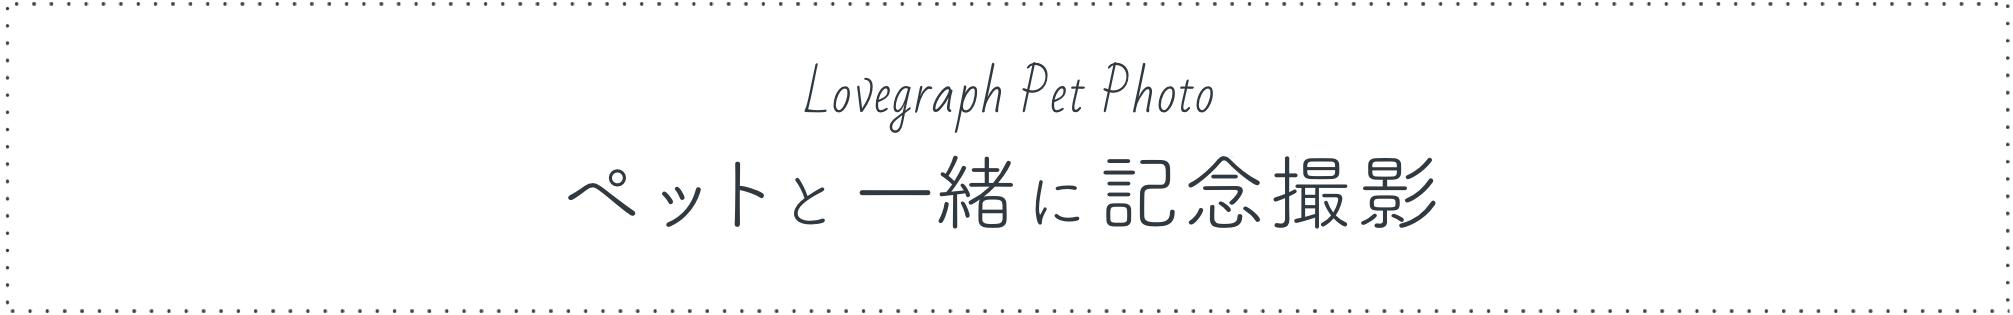 Lovegraph Pet Photo ペットと一緒に記念撮影